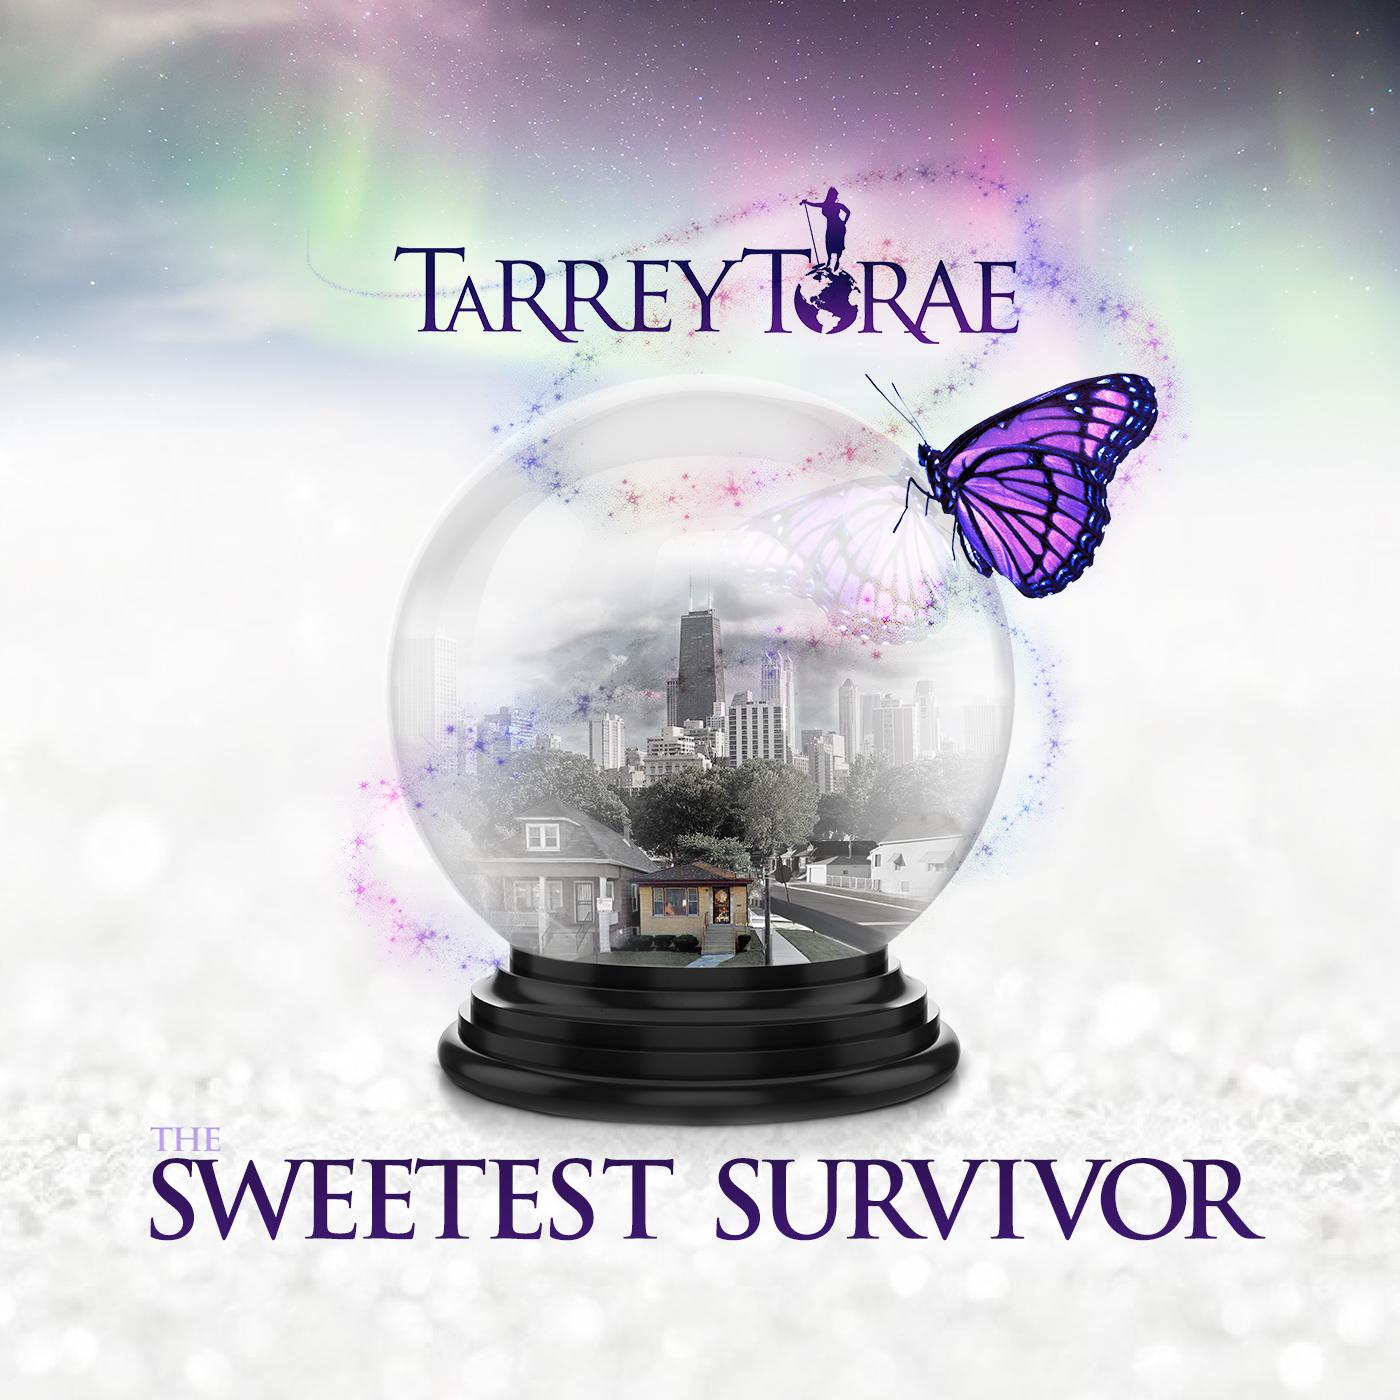 Tarrey Torae The Sweetest Survivor